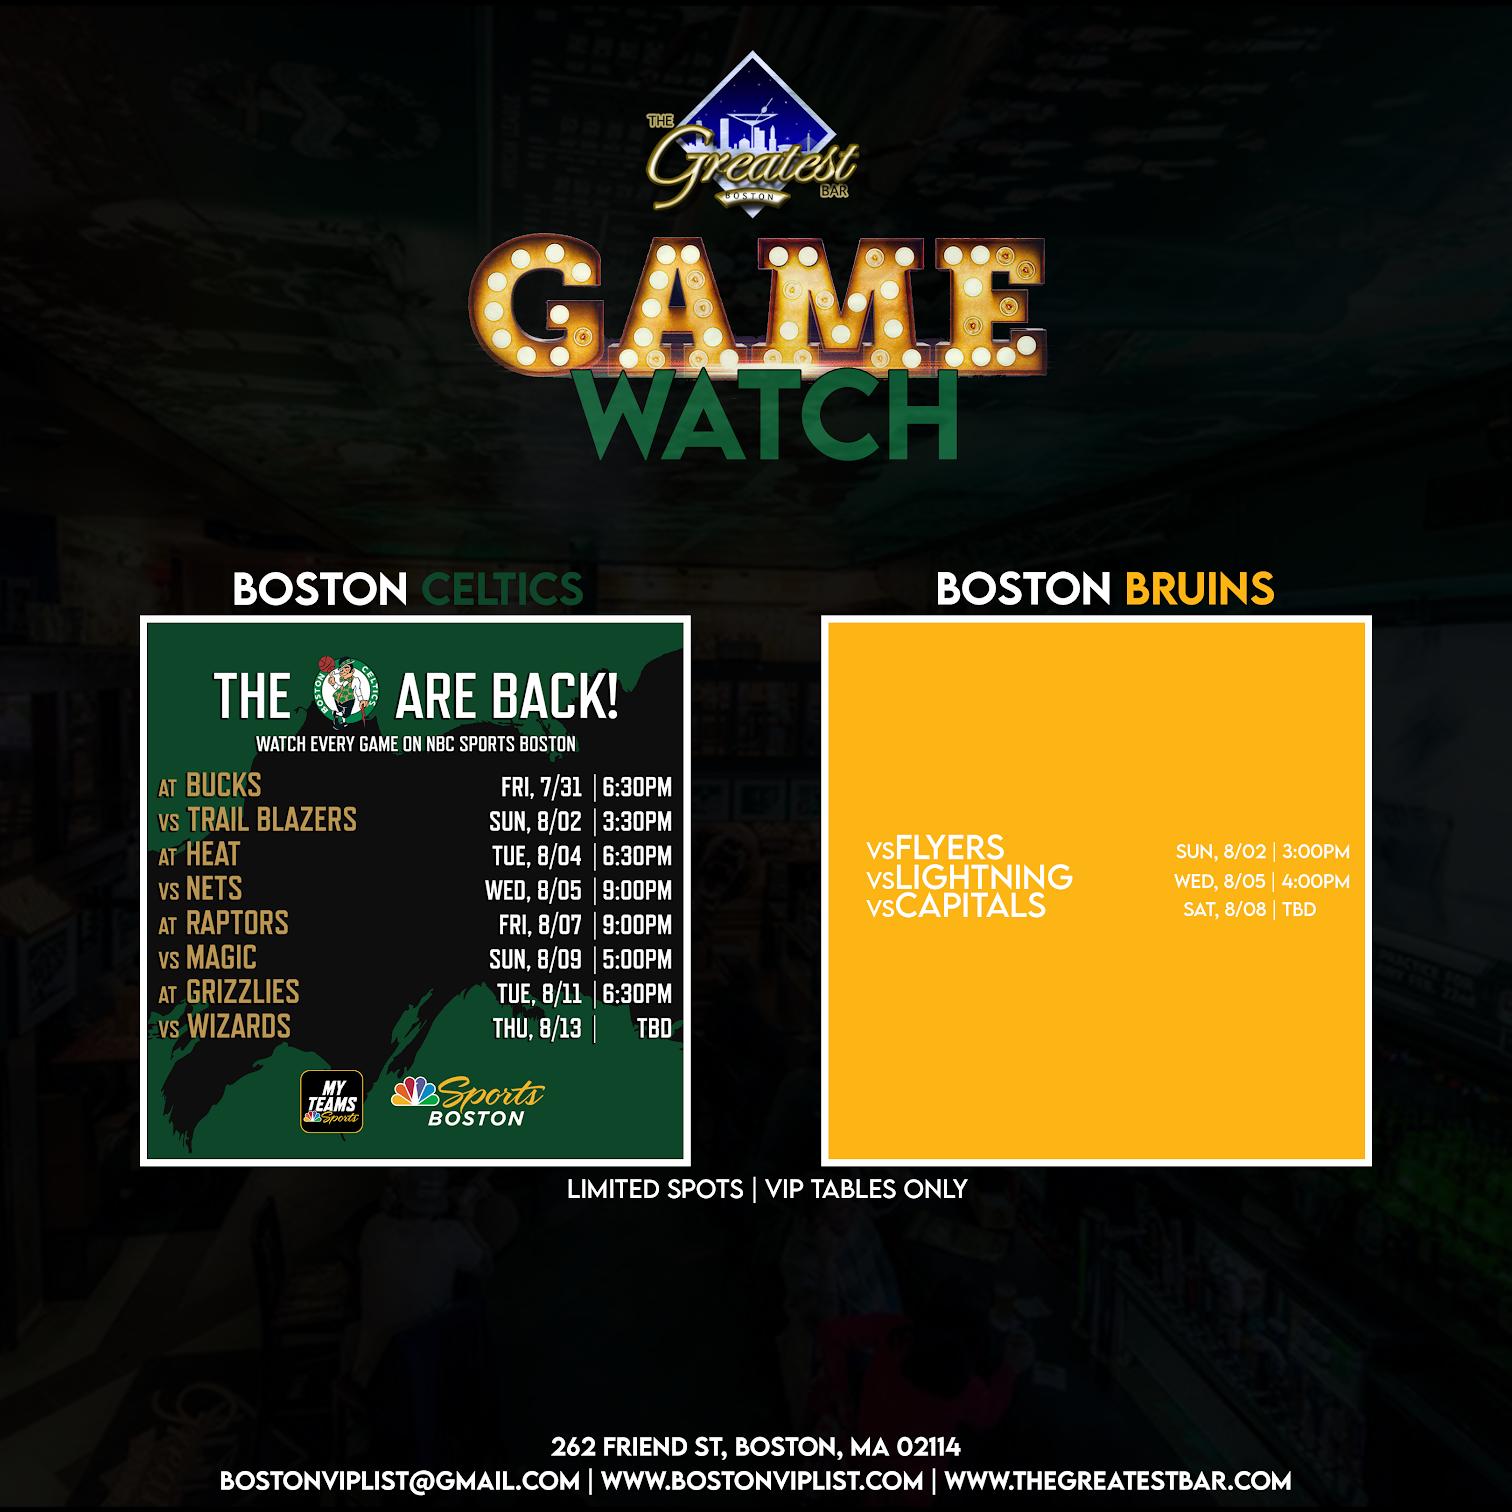 Game Watch for Bruins & Celtics